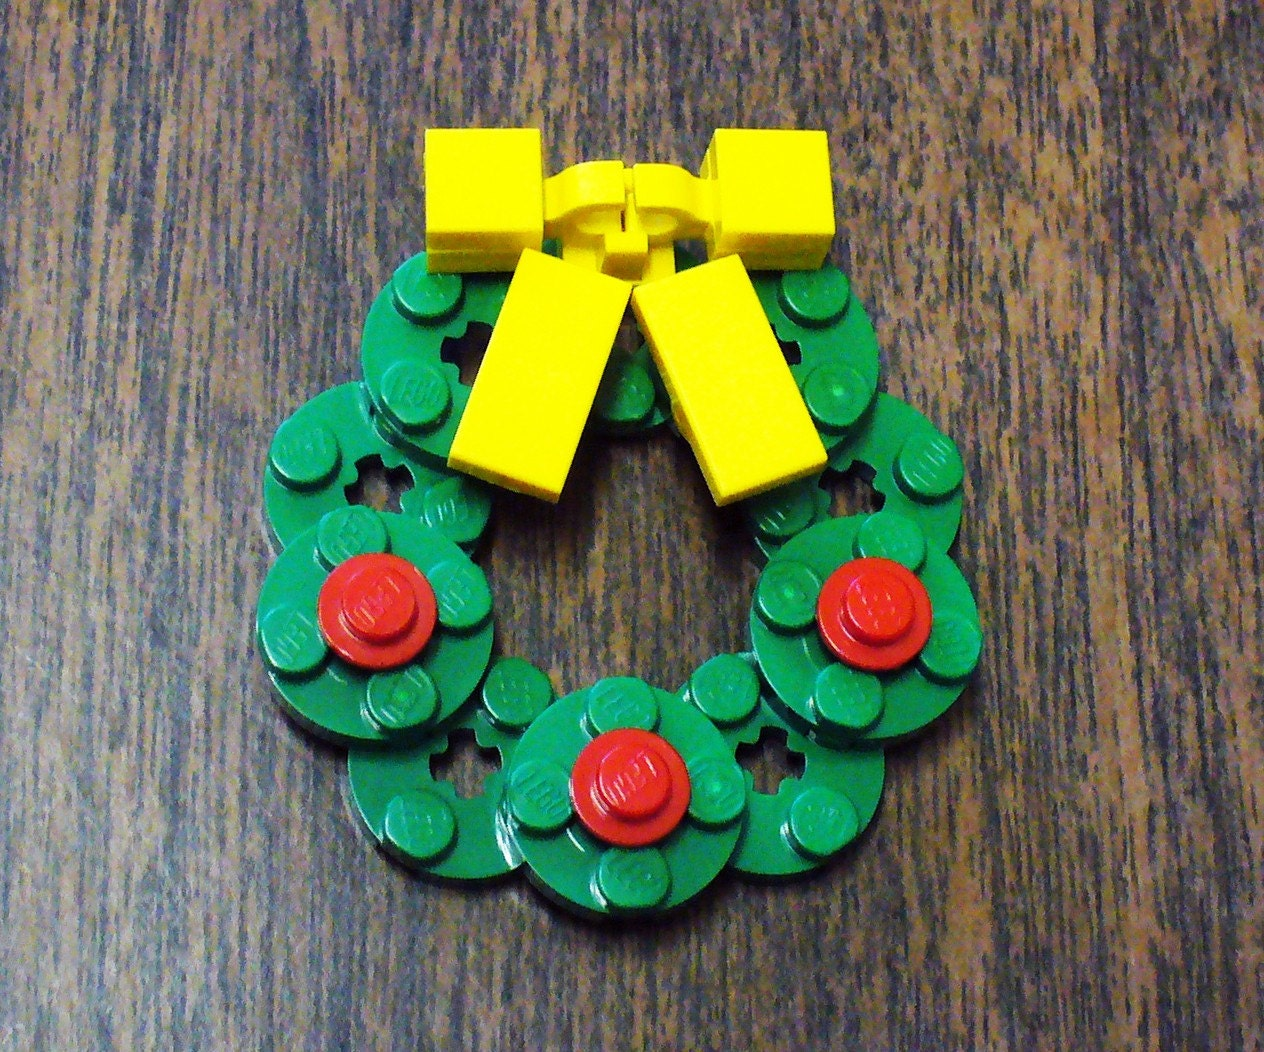 Custom Lego Christmas Wreath Pin With Yellow Bow